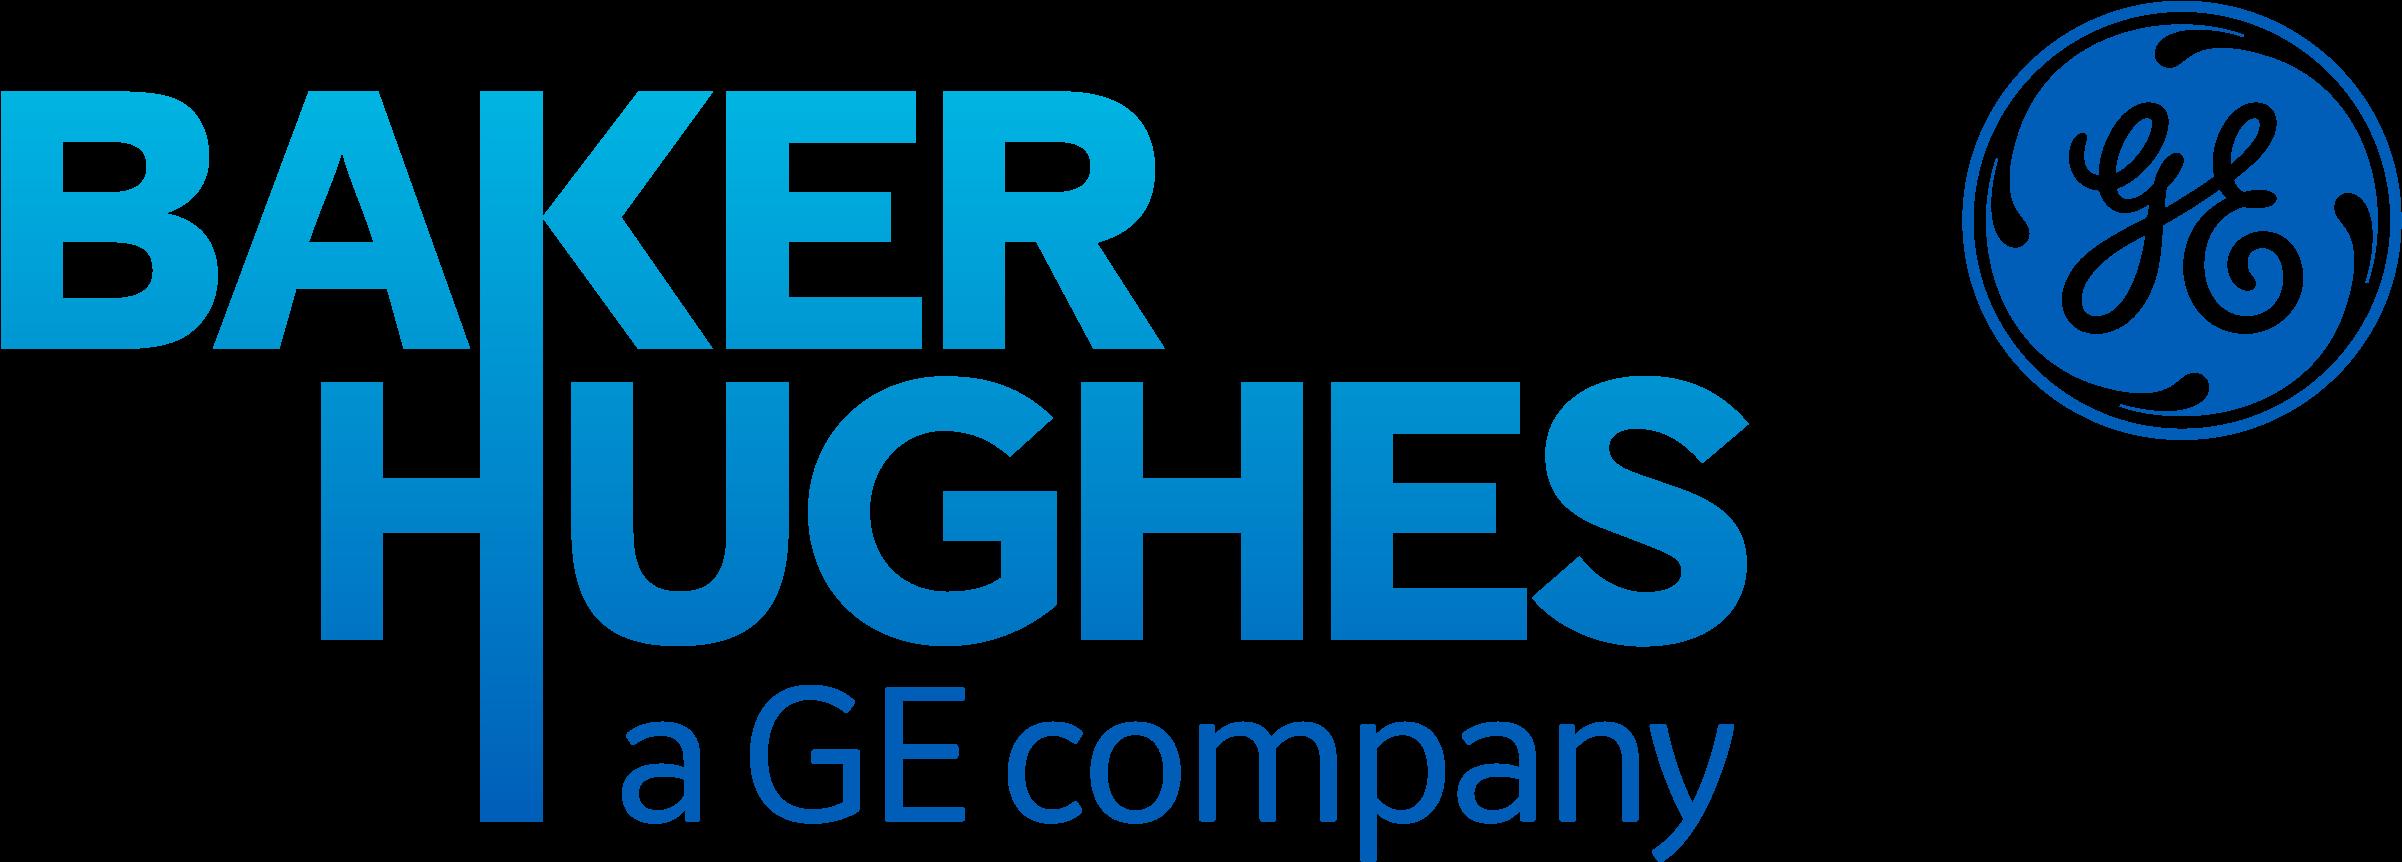 PDL Client Logo, Baker Hughes, GE Company